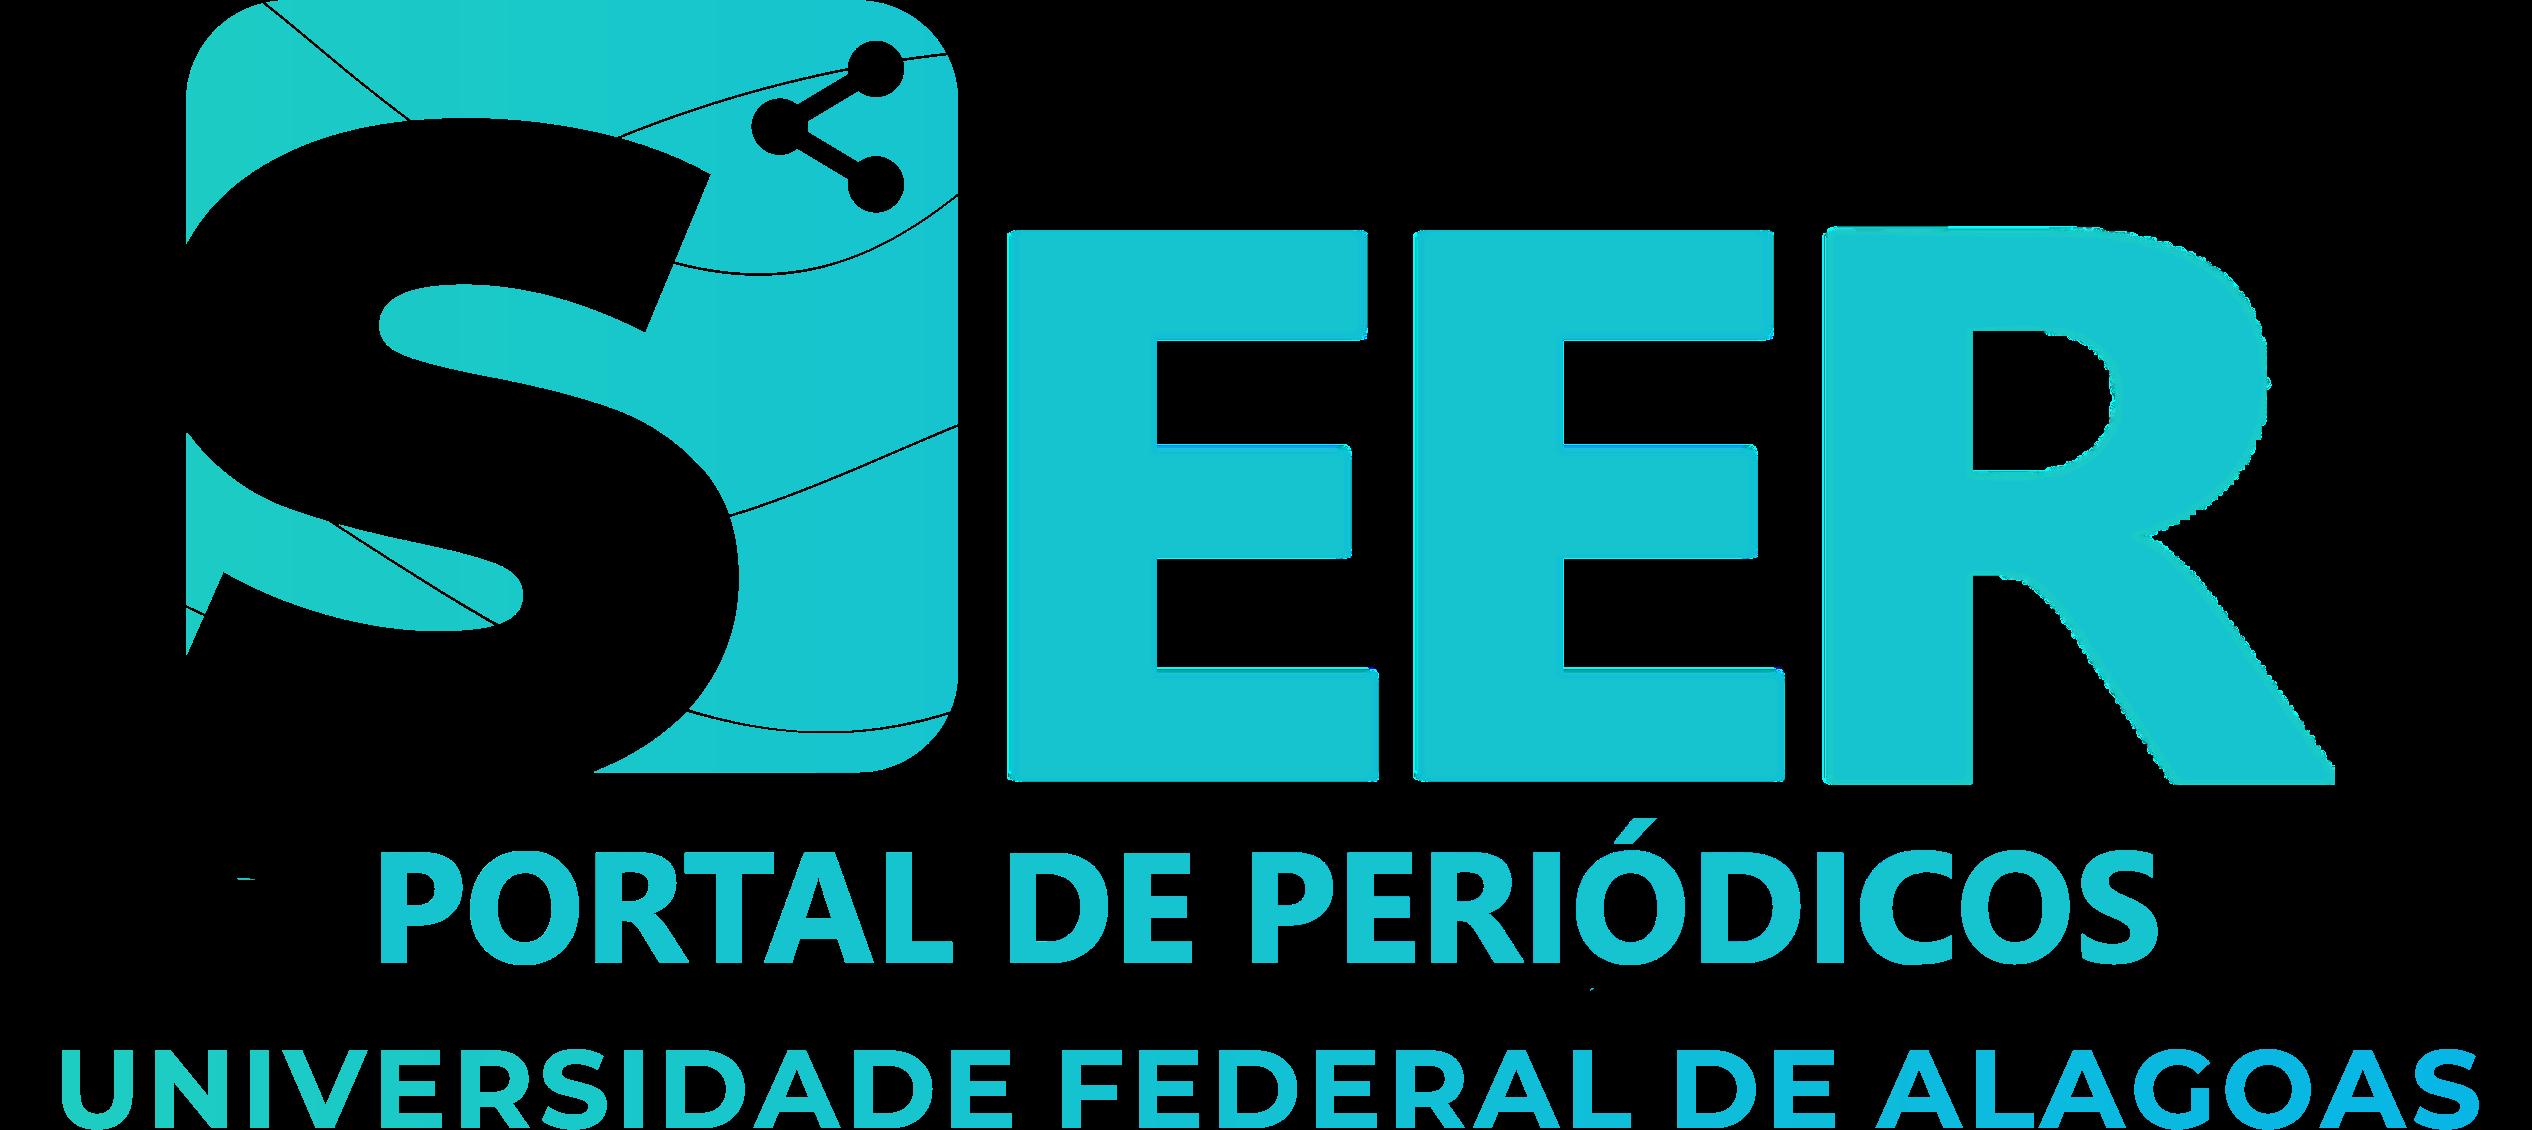 Logo Portal de Periódicos UFAL